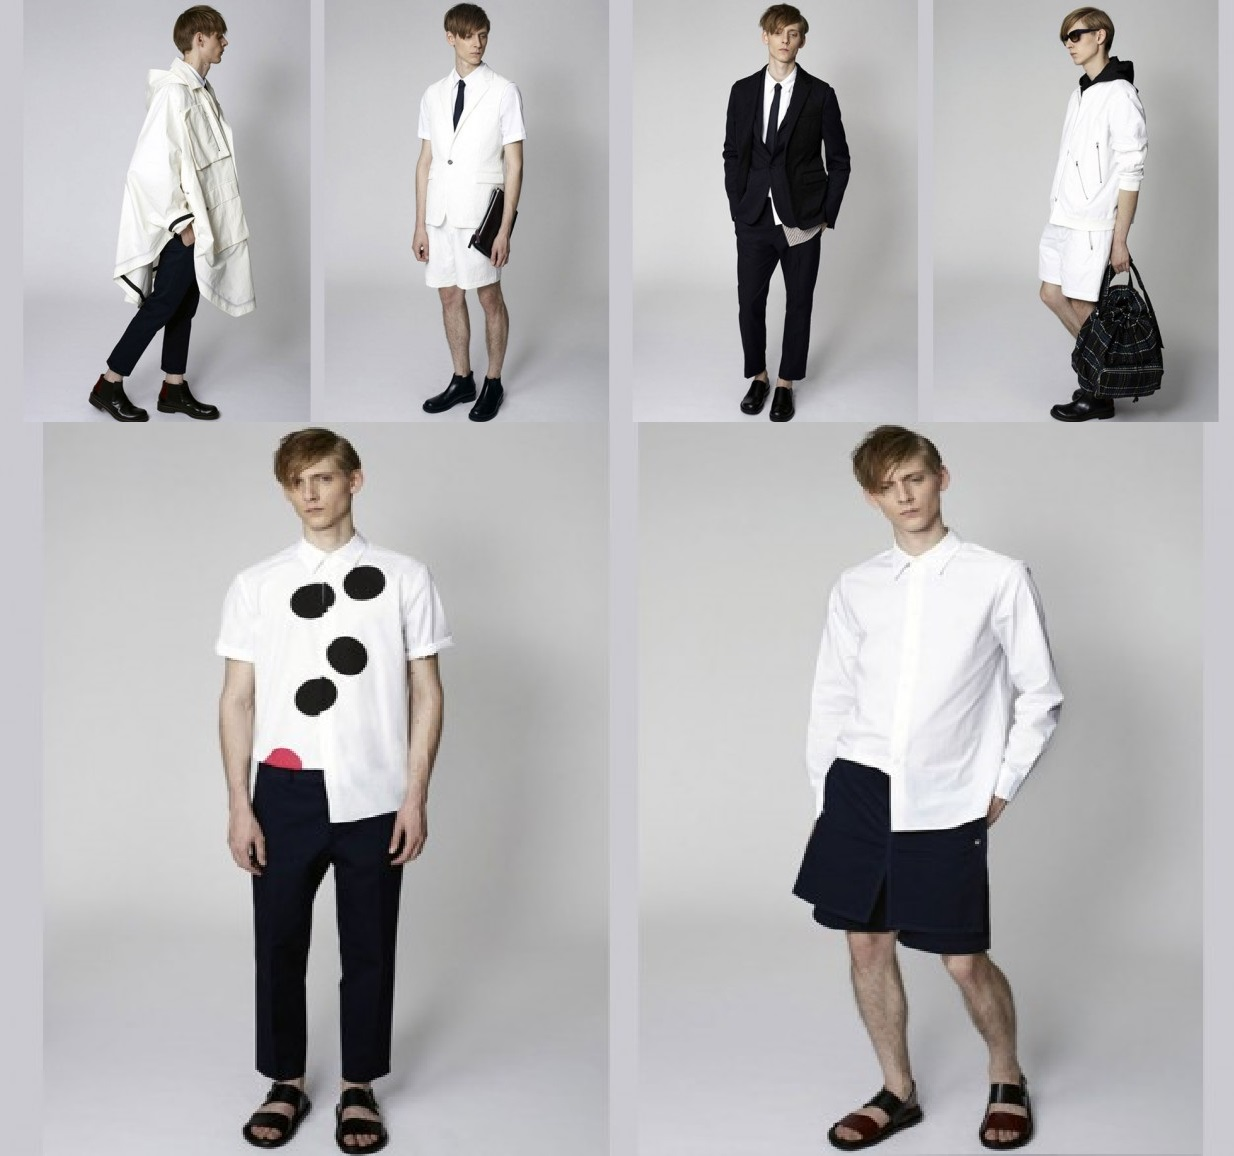 Amanda Archetti stile biancoenero  abbigliamento uomo personalshopper imageconsultant  personalstylist silkgiftmilan shopping